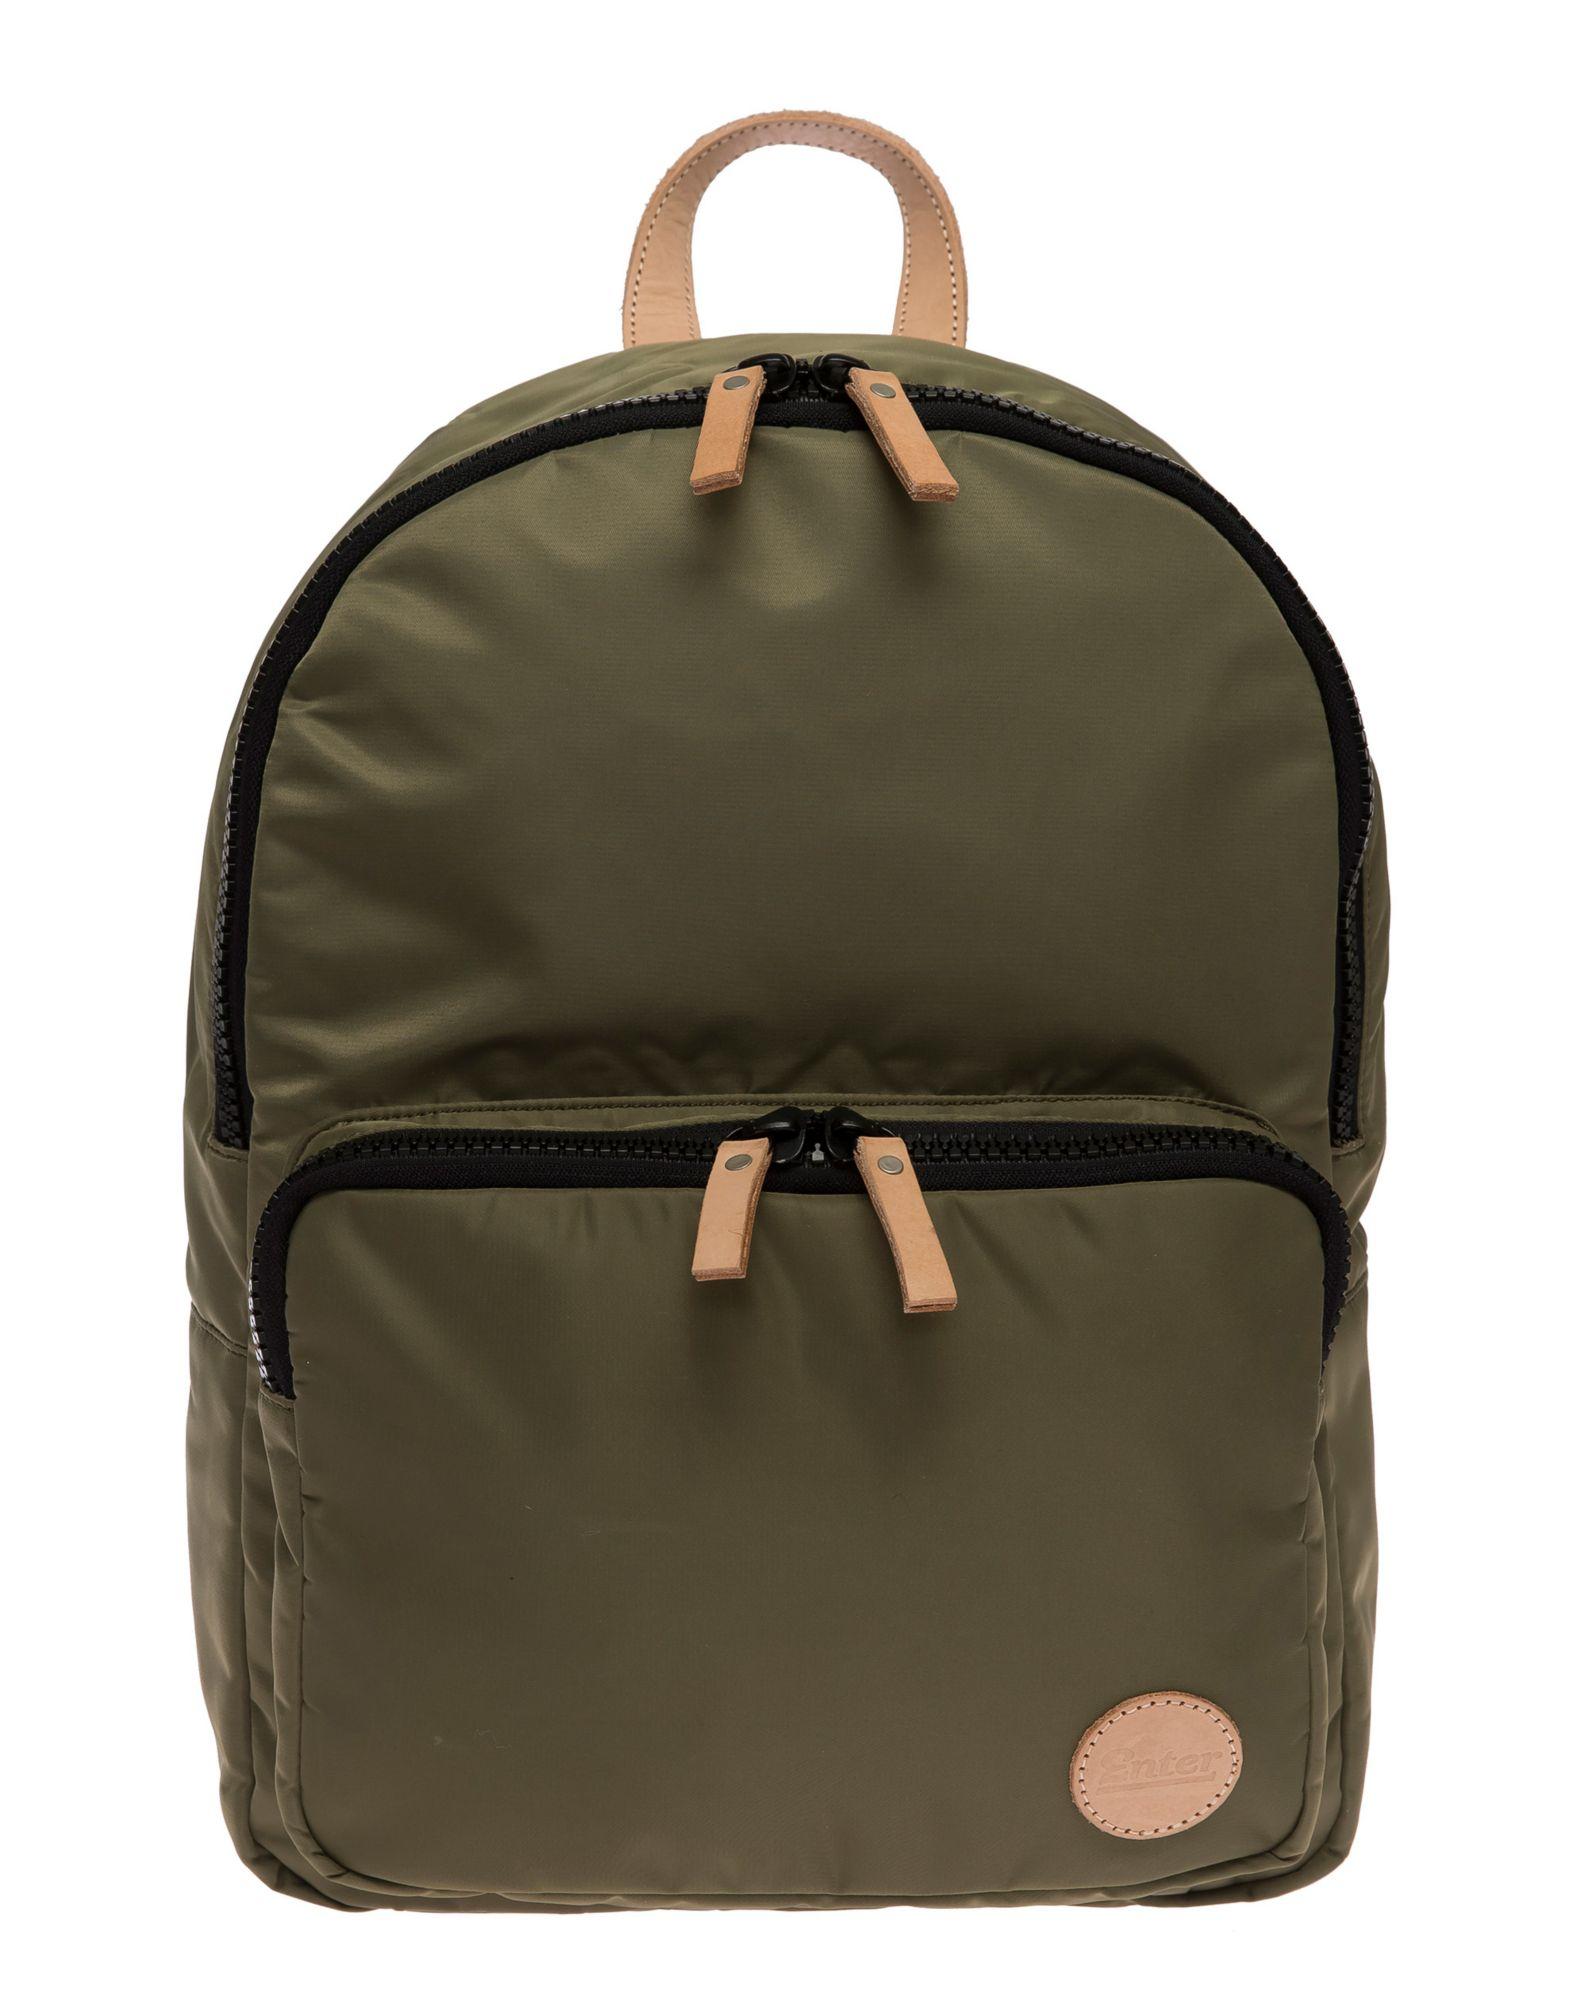 ENTER Enter Street-Style-Rucksack, »Gym Backpack, Army Green/Natural«